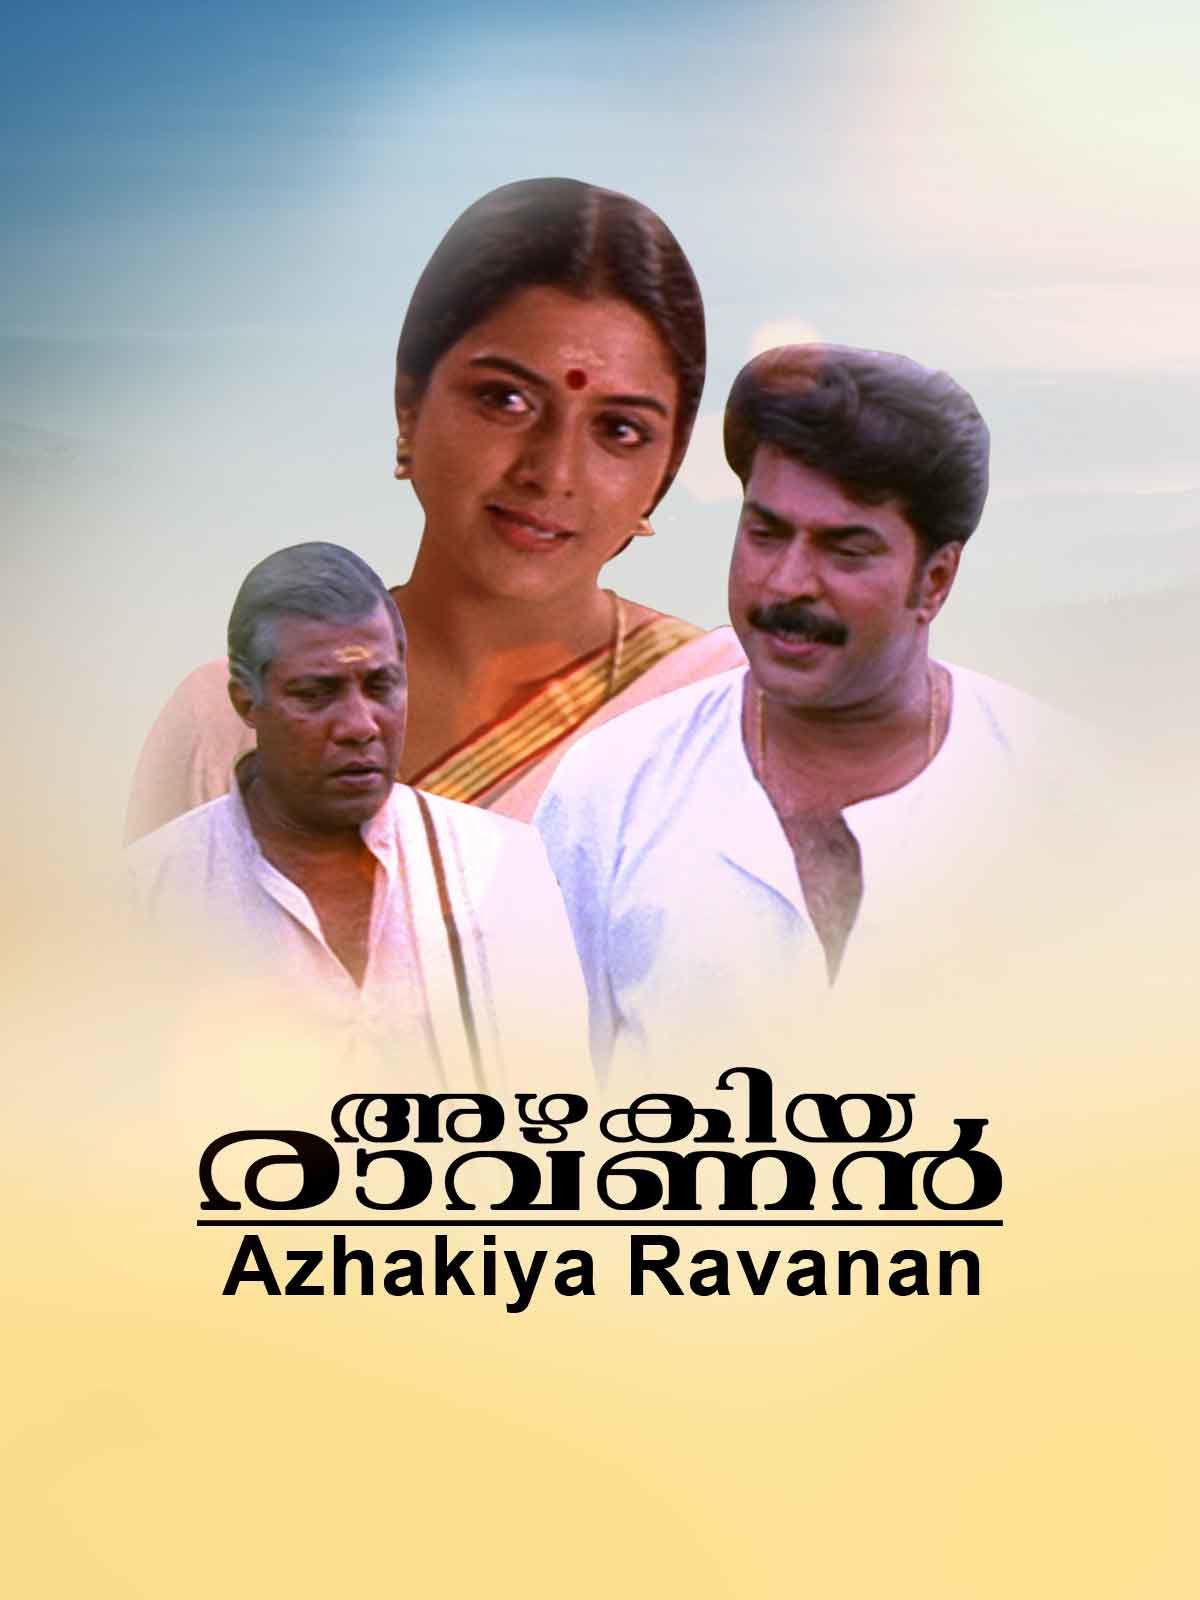 Azhakiya Ravanan